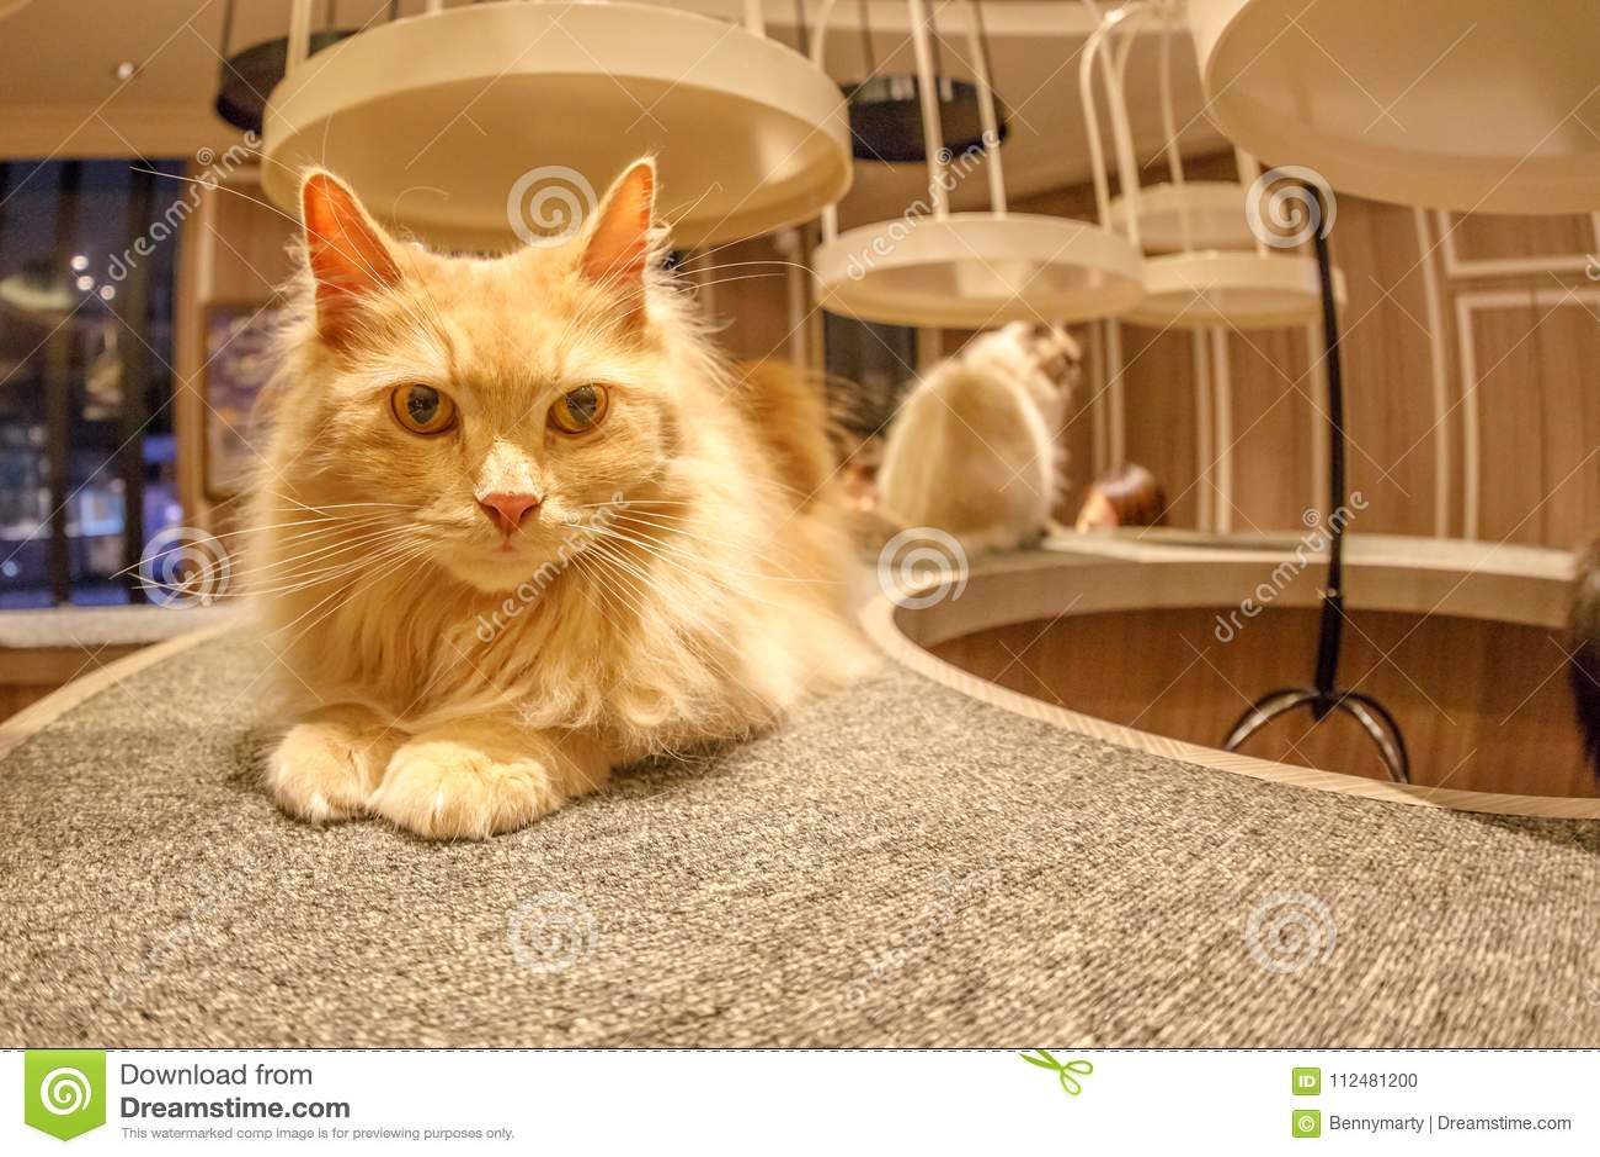 Cat Cafe Mocha Foto De Archivo Imagen De Mocha Cafe 112481200